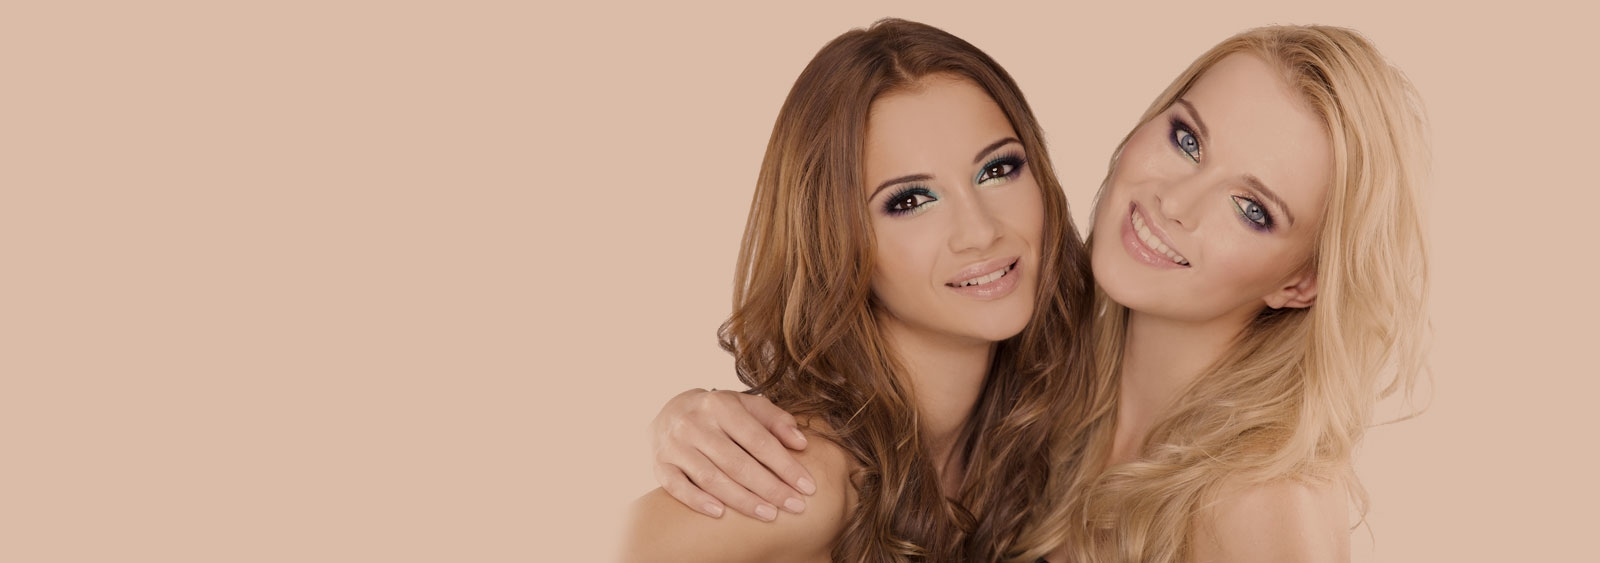 Beautician Websites (@beauticianwebsites) Cover Image